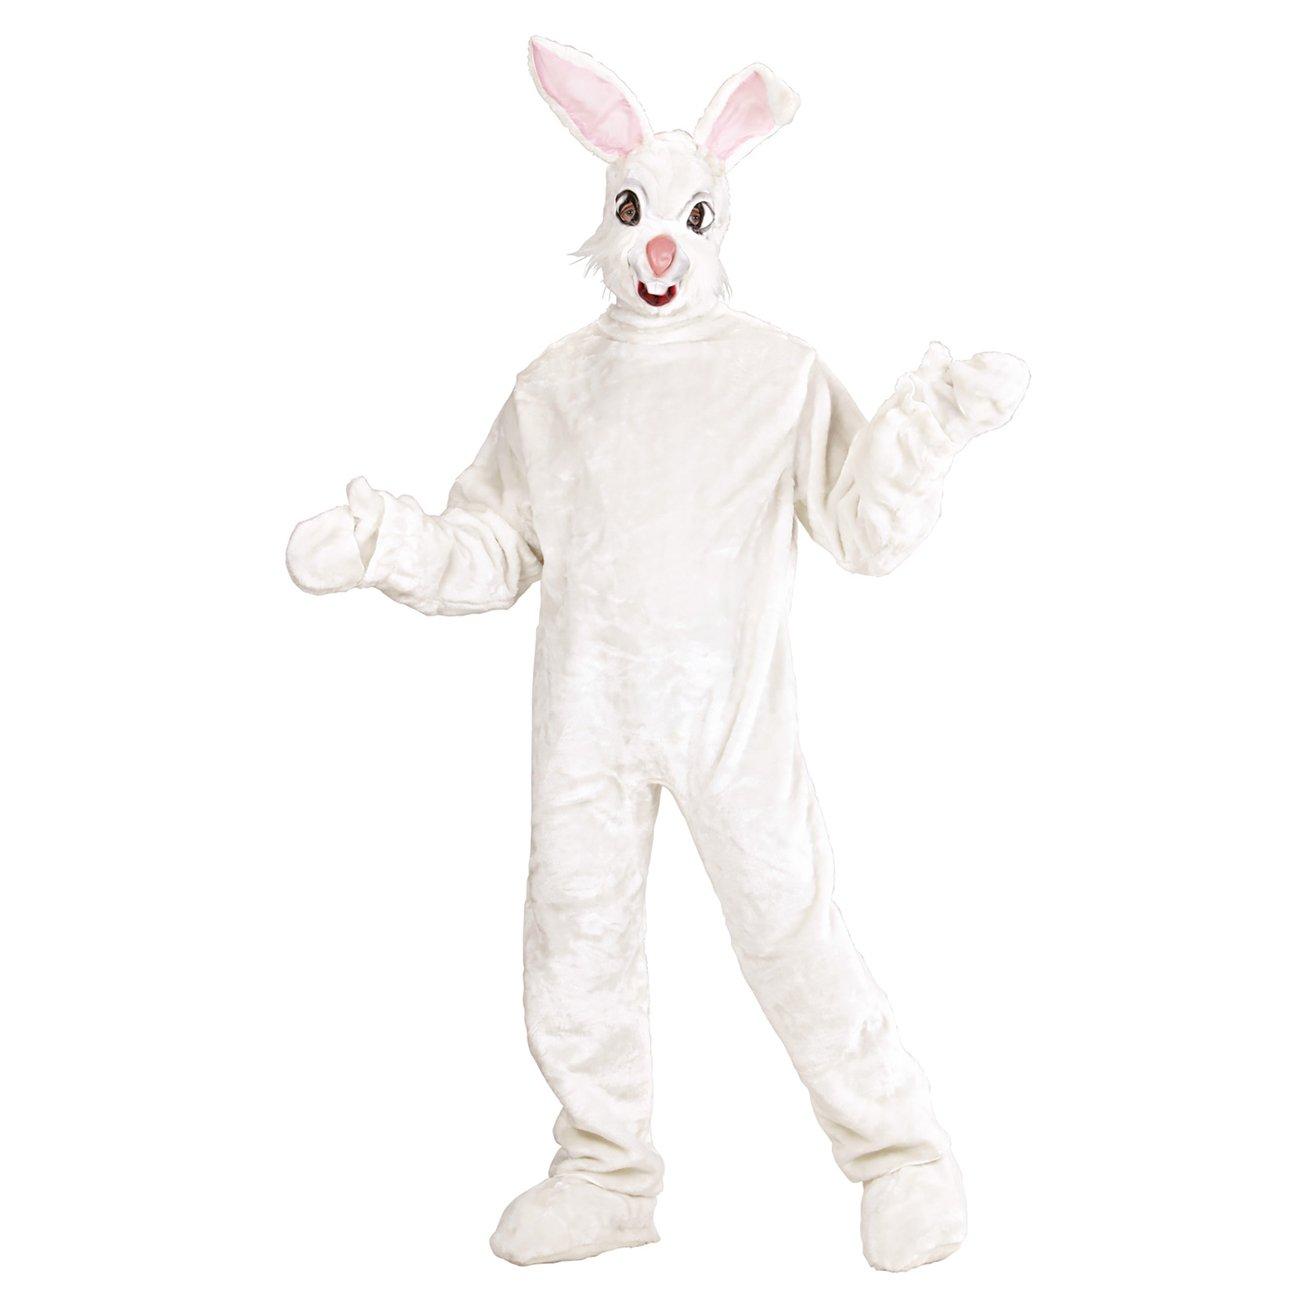 Amazon.com: Mens Plush Bunny Costume For Animal Jungle Farm Fancy Dress: Home Improvement